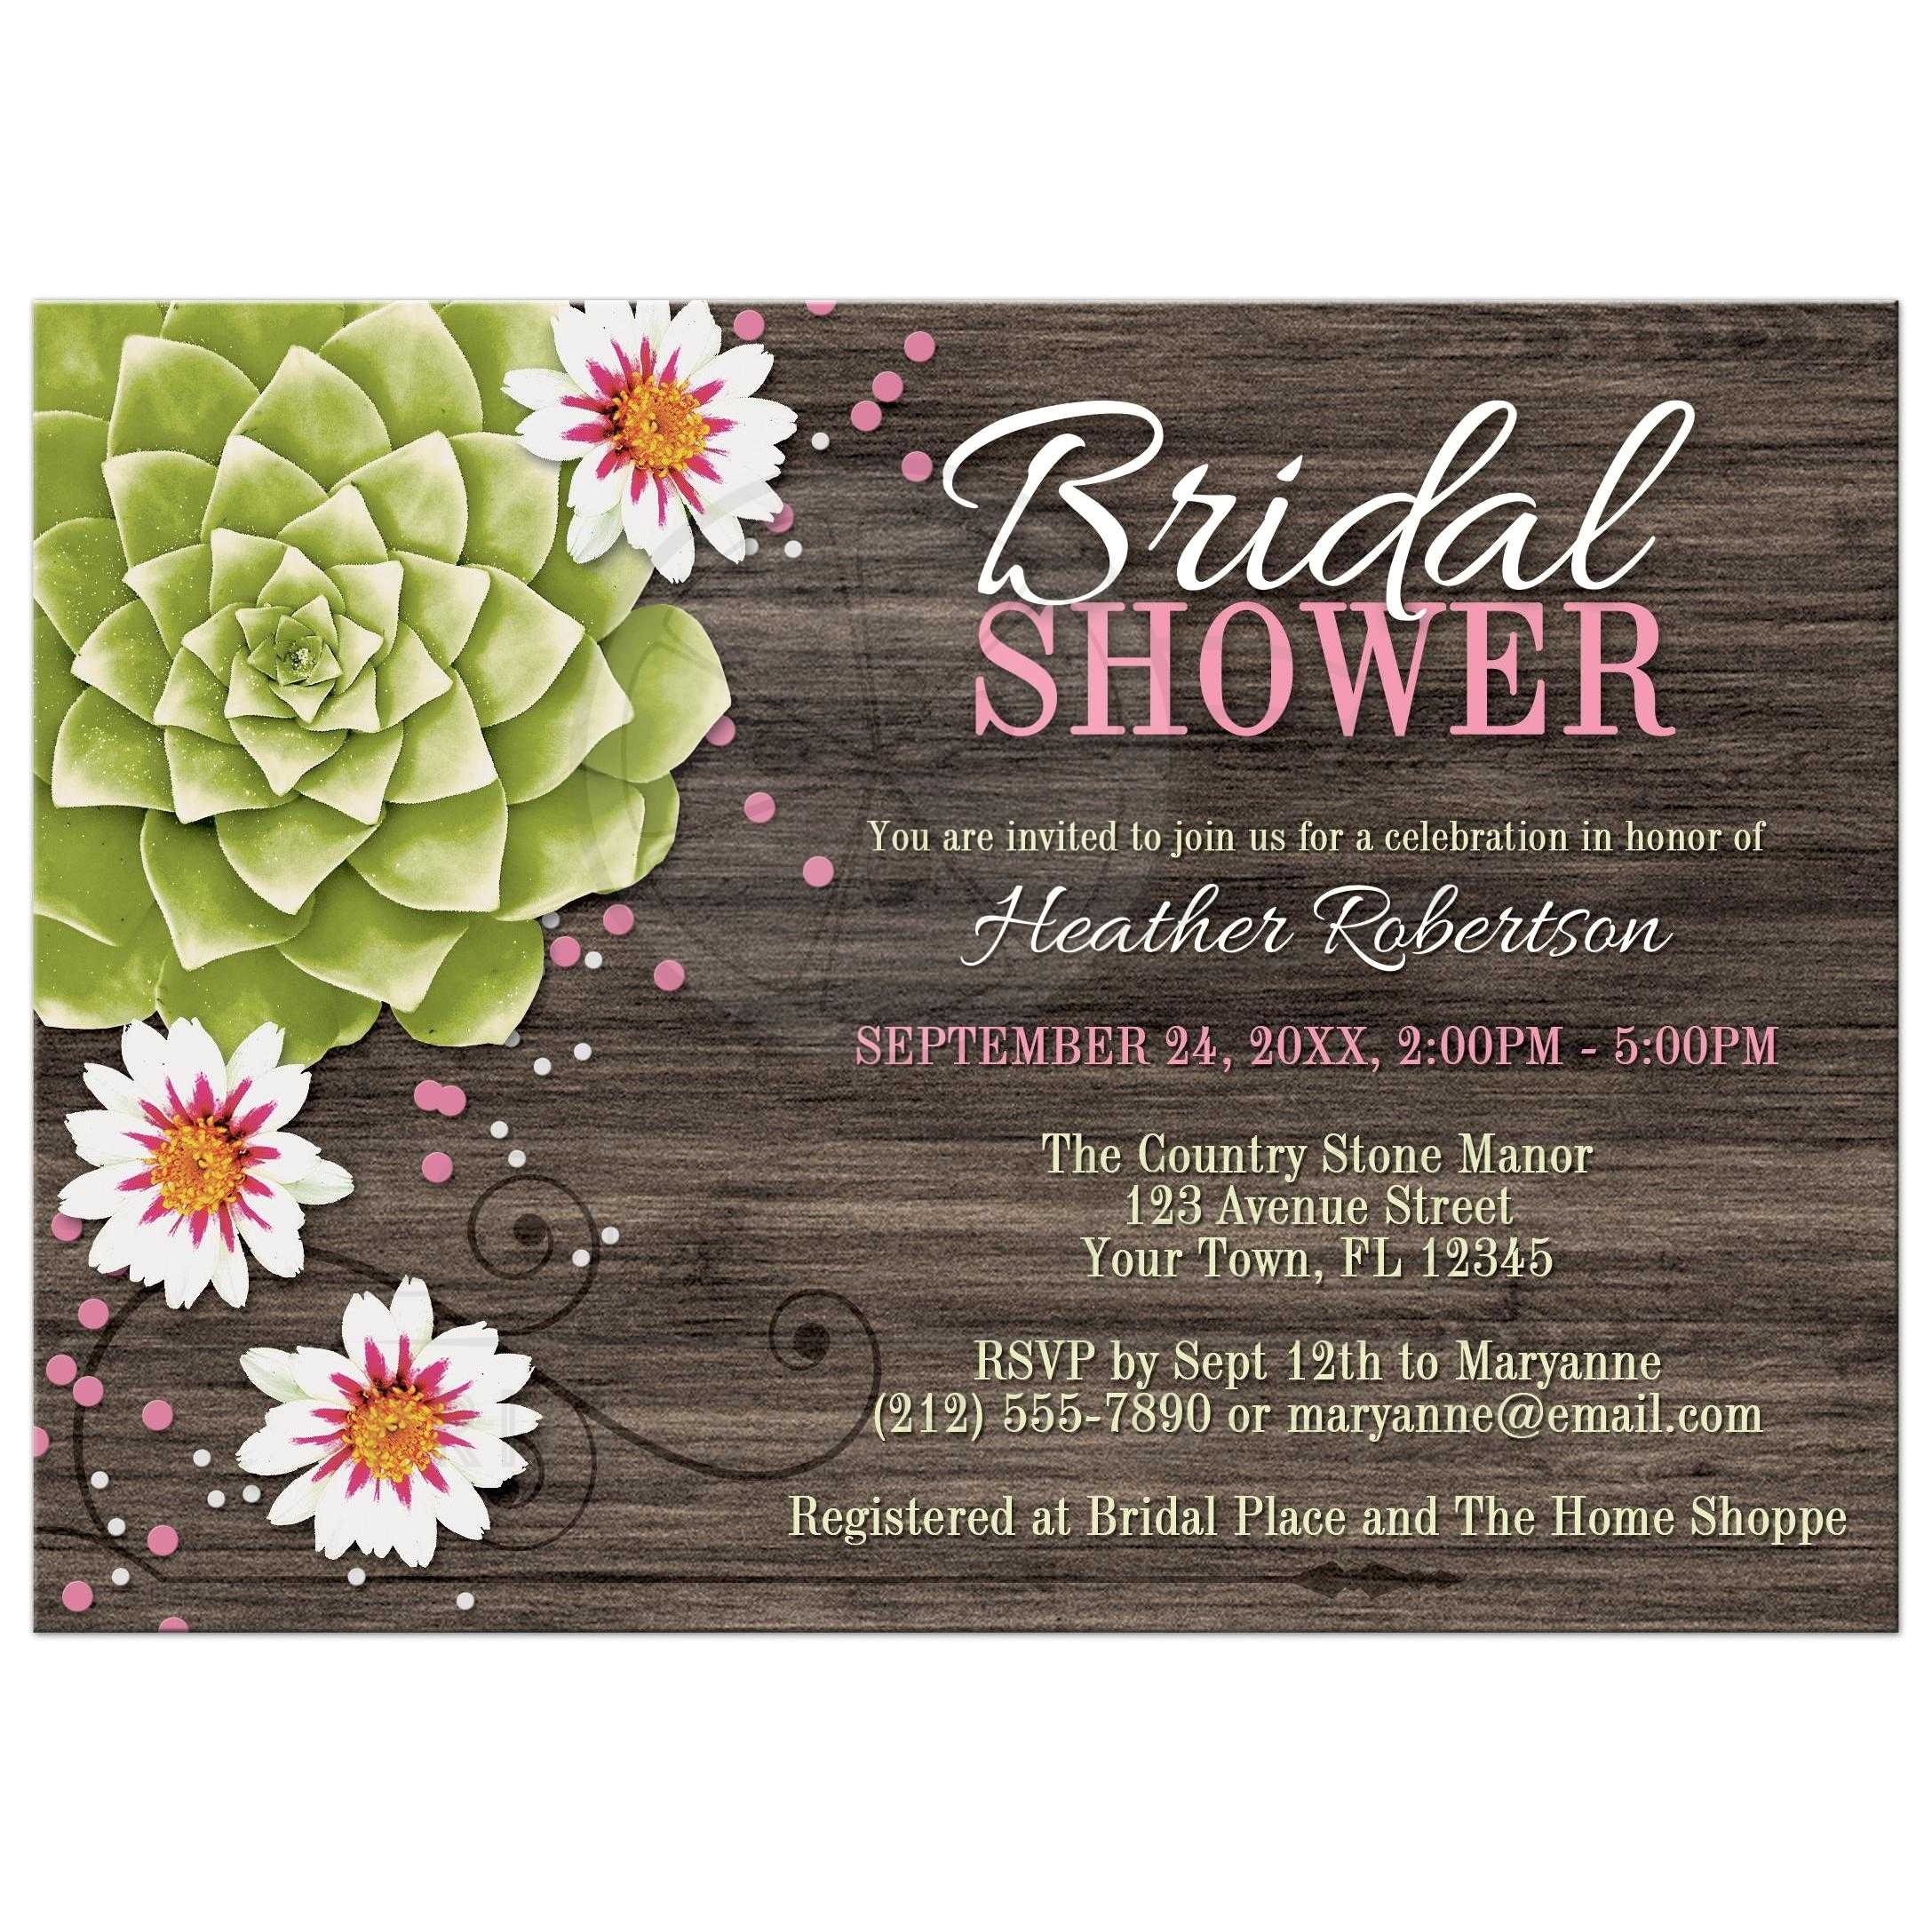 Succulent Bridal Shower Invitations Bridal Shower Invitations Rustic Succulent Floral Wood Pink